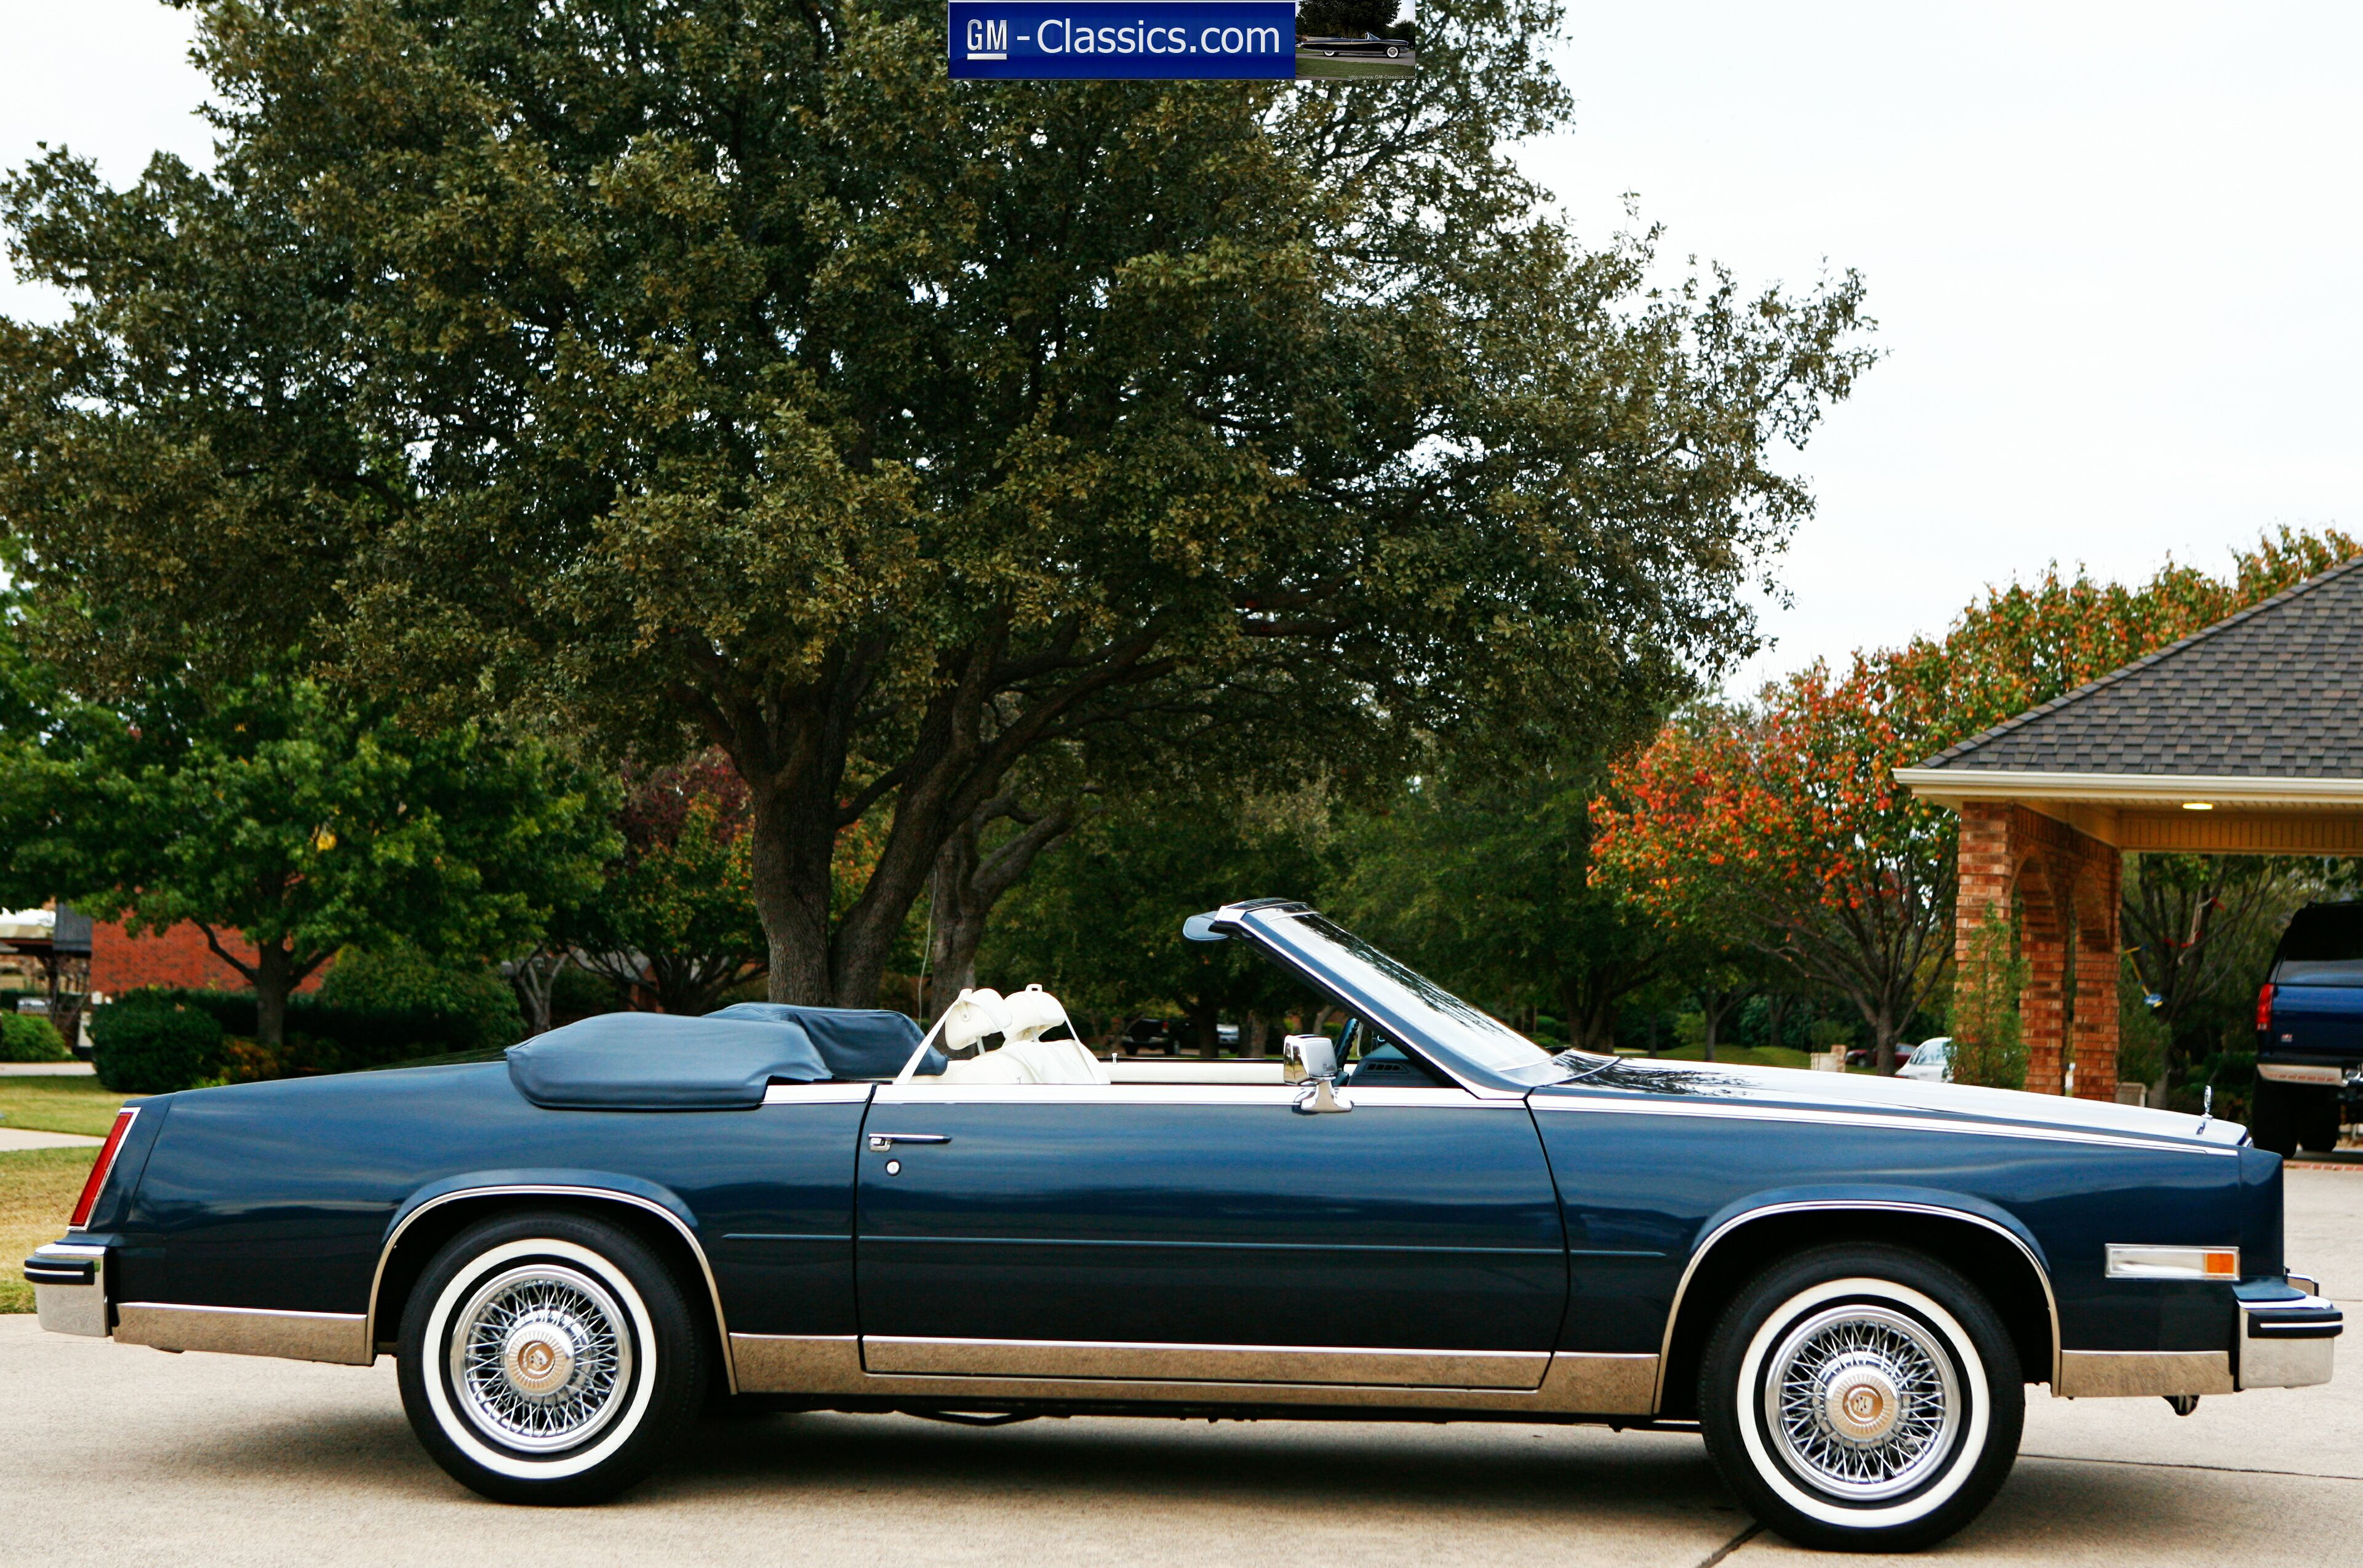 1985 Cadillac Eldorado Commemorative Convertible - Matt Garrett